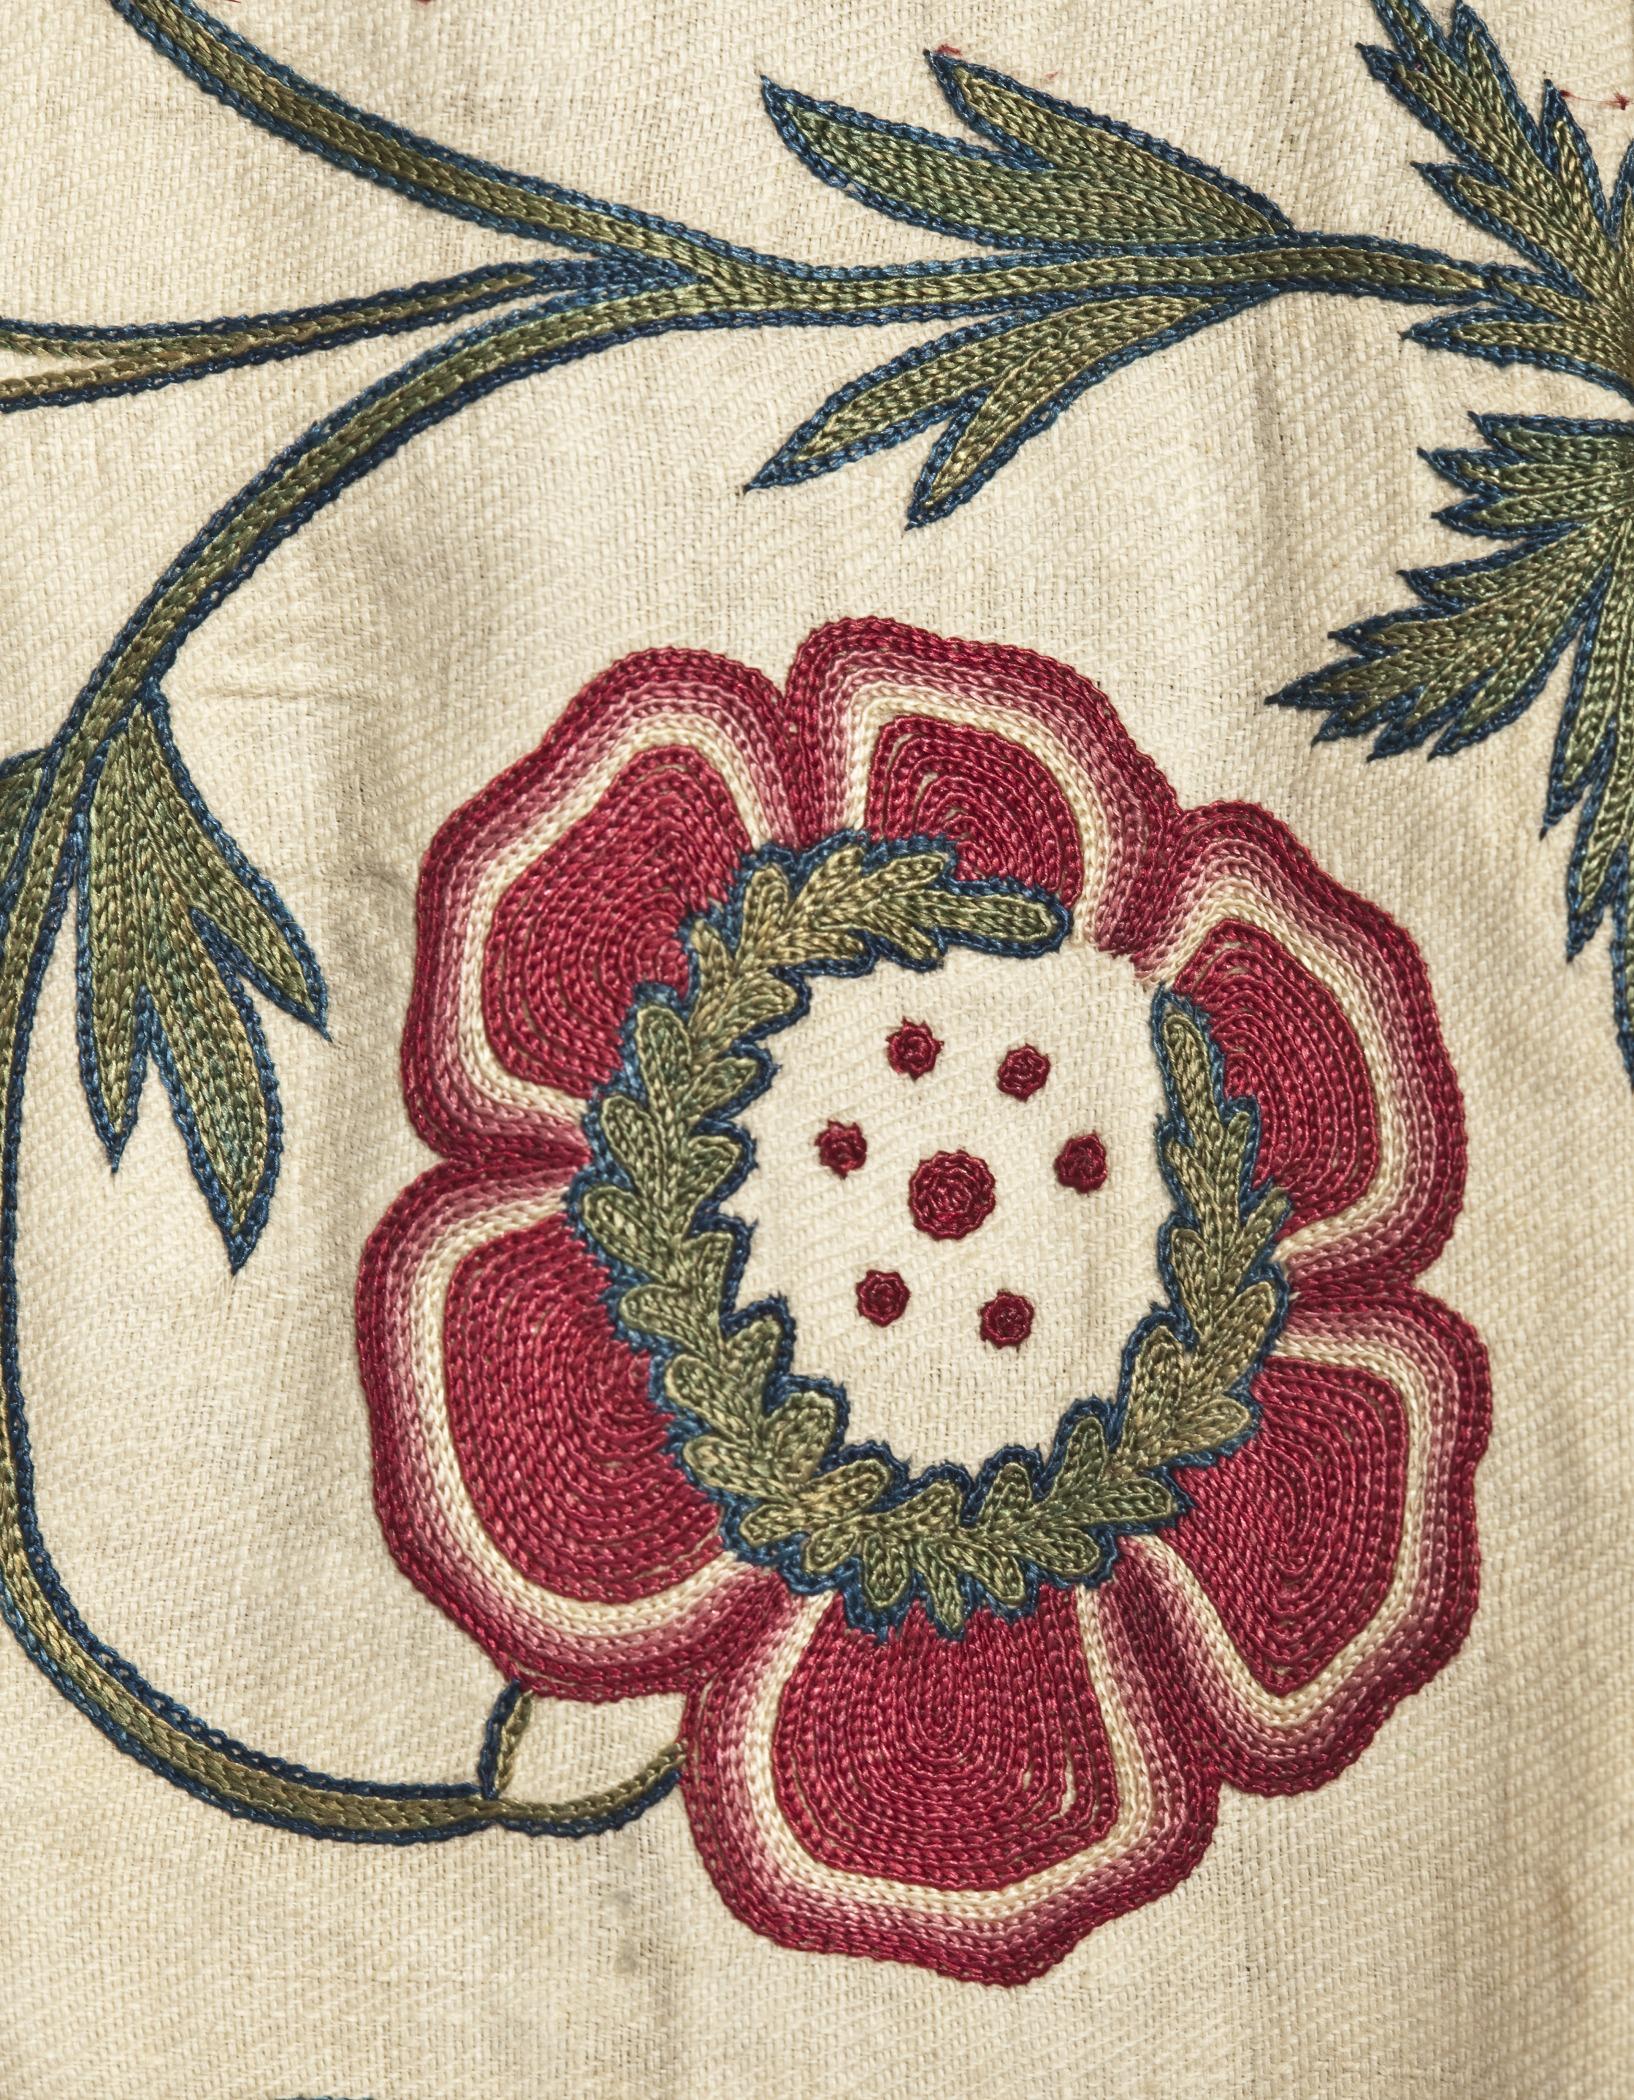 Embroidery floss wiki makaroka